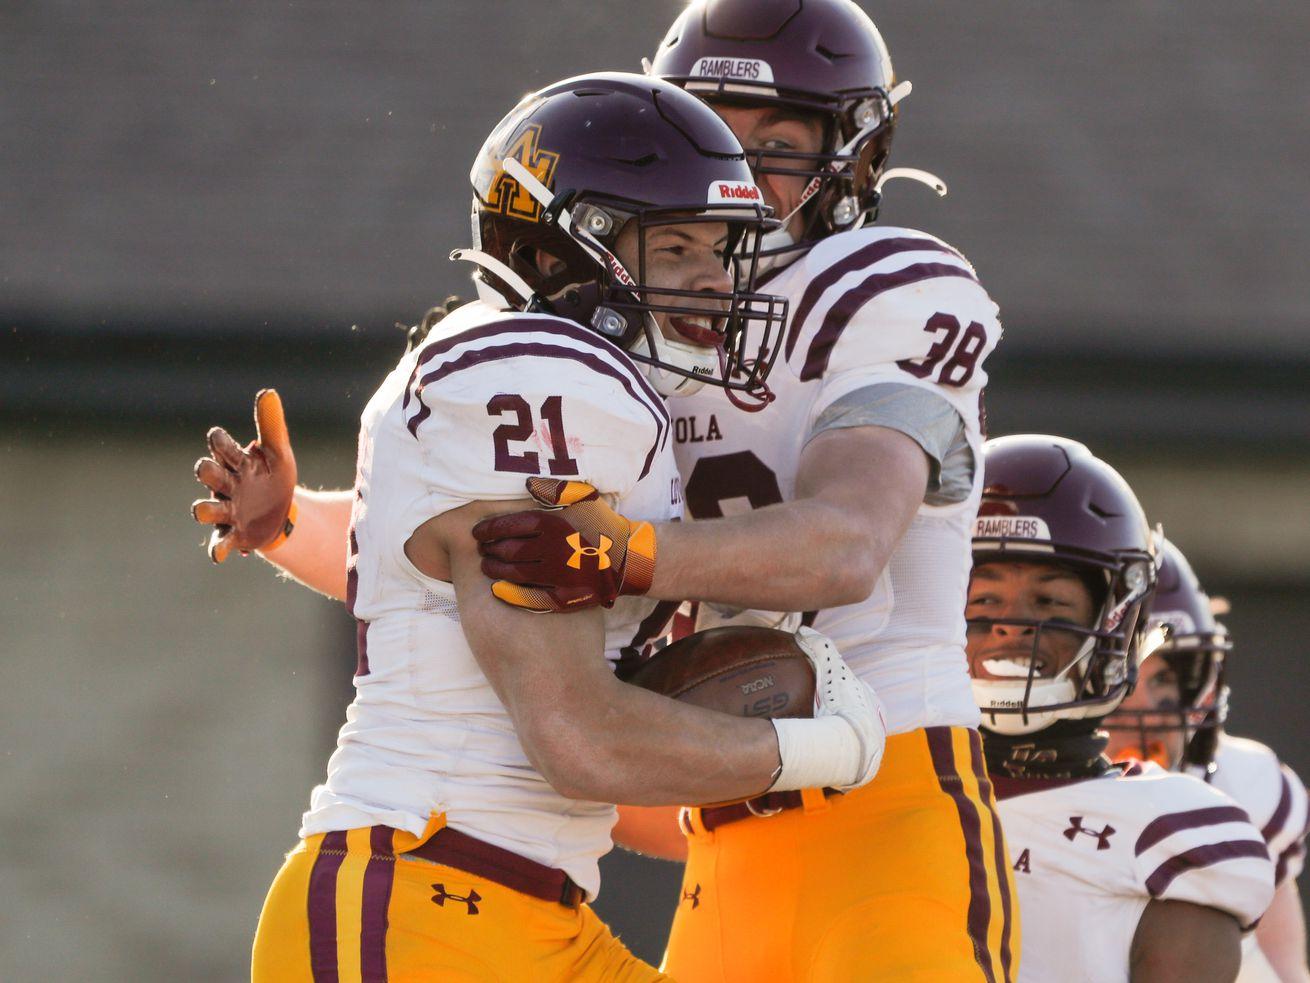 Loyola's Vaughn Pemberton (21) celebrates his touchdown against Brother Rice.